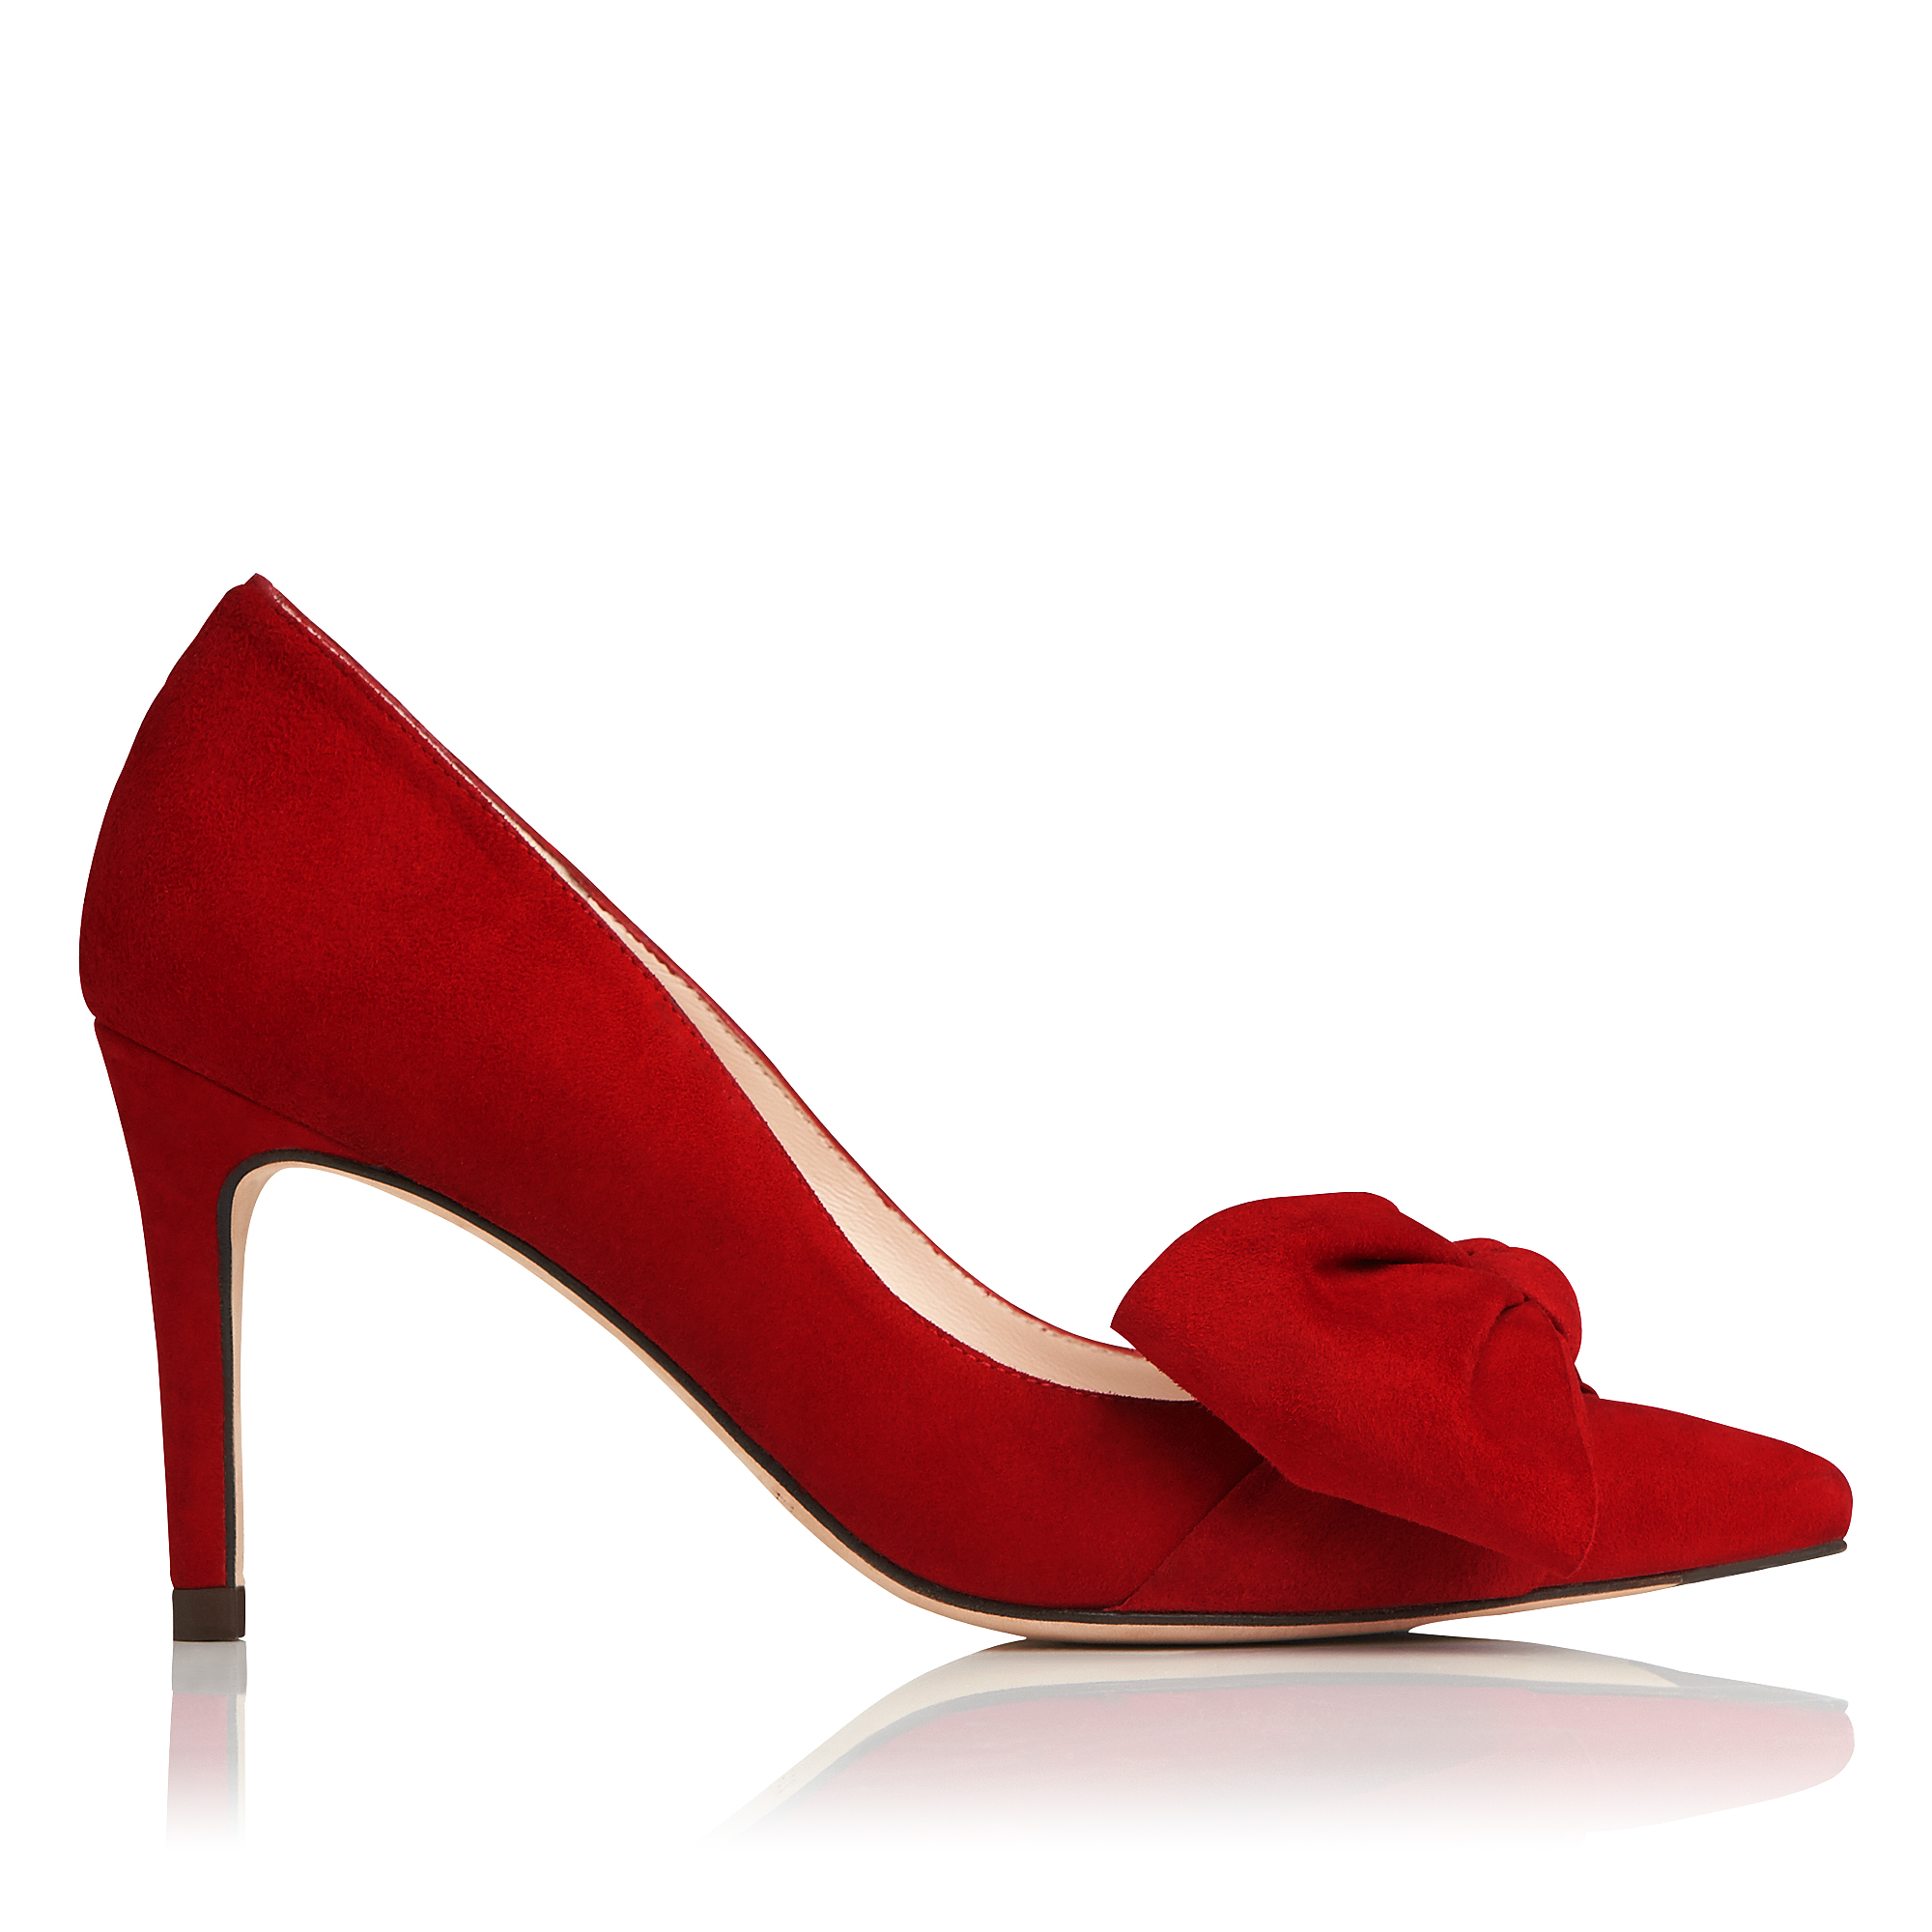 chaussures tendance l k bennett des chaussures tendance nos pieds elle. Black Bedroom Furniture Sets. Home Design Ideas